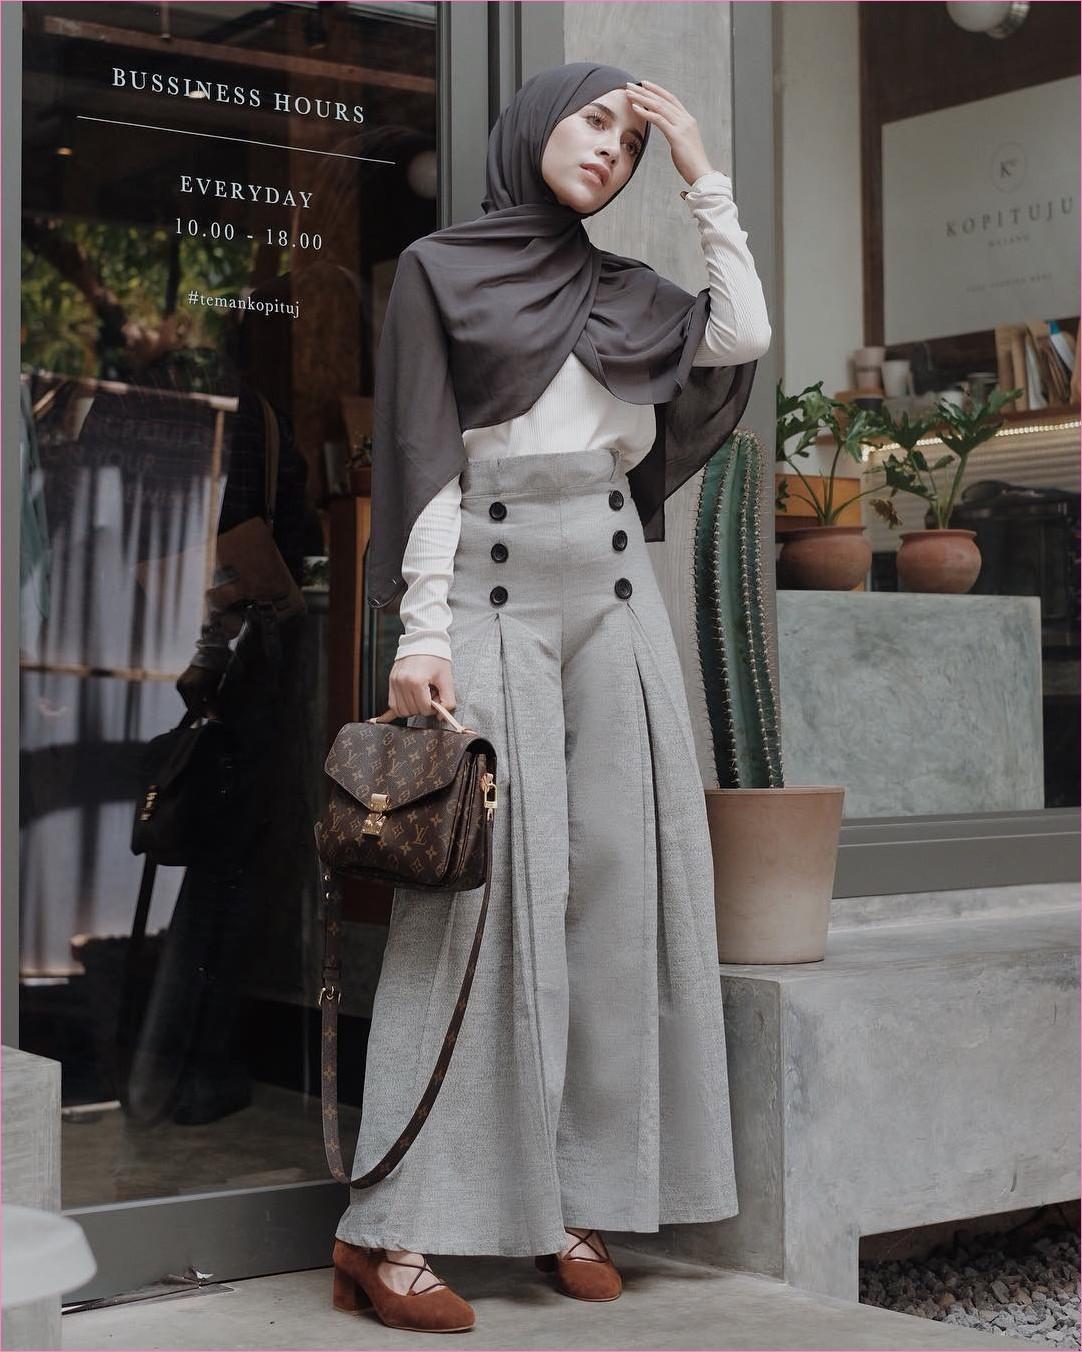 Outfit Kerudung Pashmina Ala Selebgram 2018 hijab pashmina sifon coklat tua mangset putih celana pallazo kulot abu slingbags coklat tua sepatu cleopatra coklat ootd hijabers kekinian trendy kaca pot kaktus